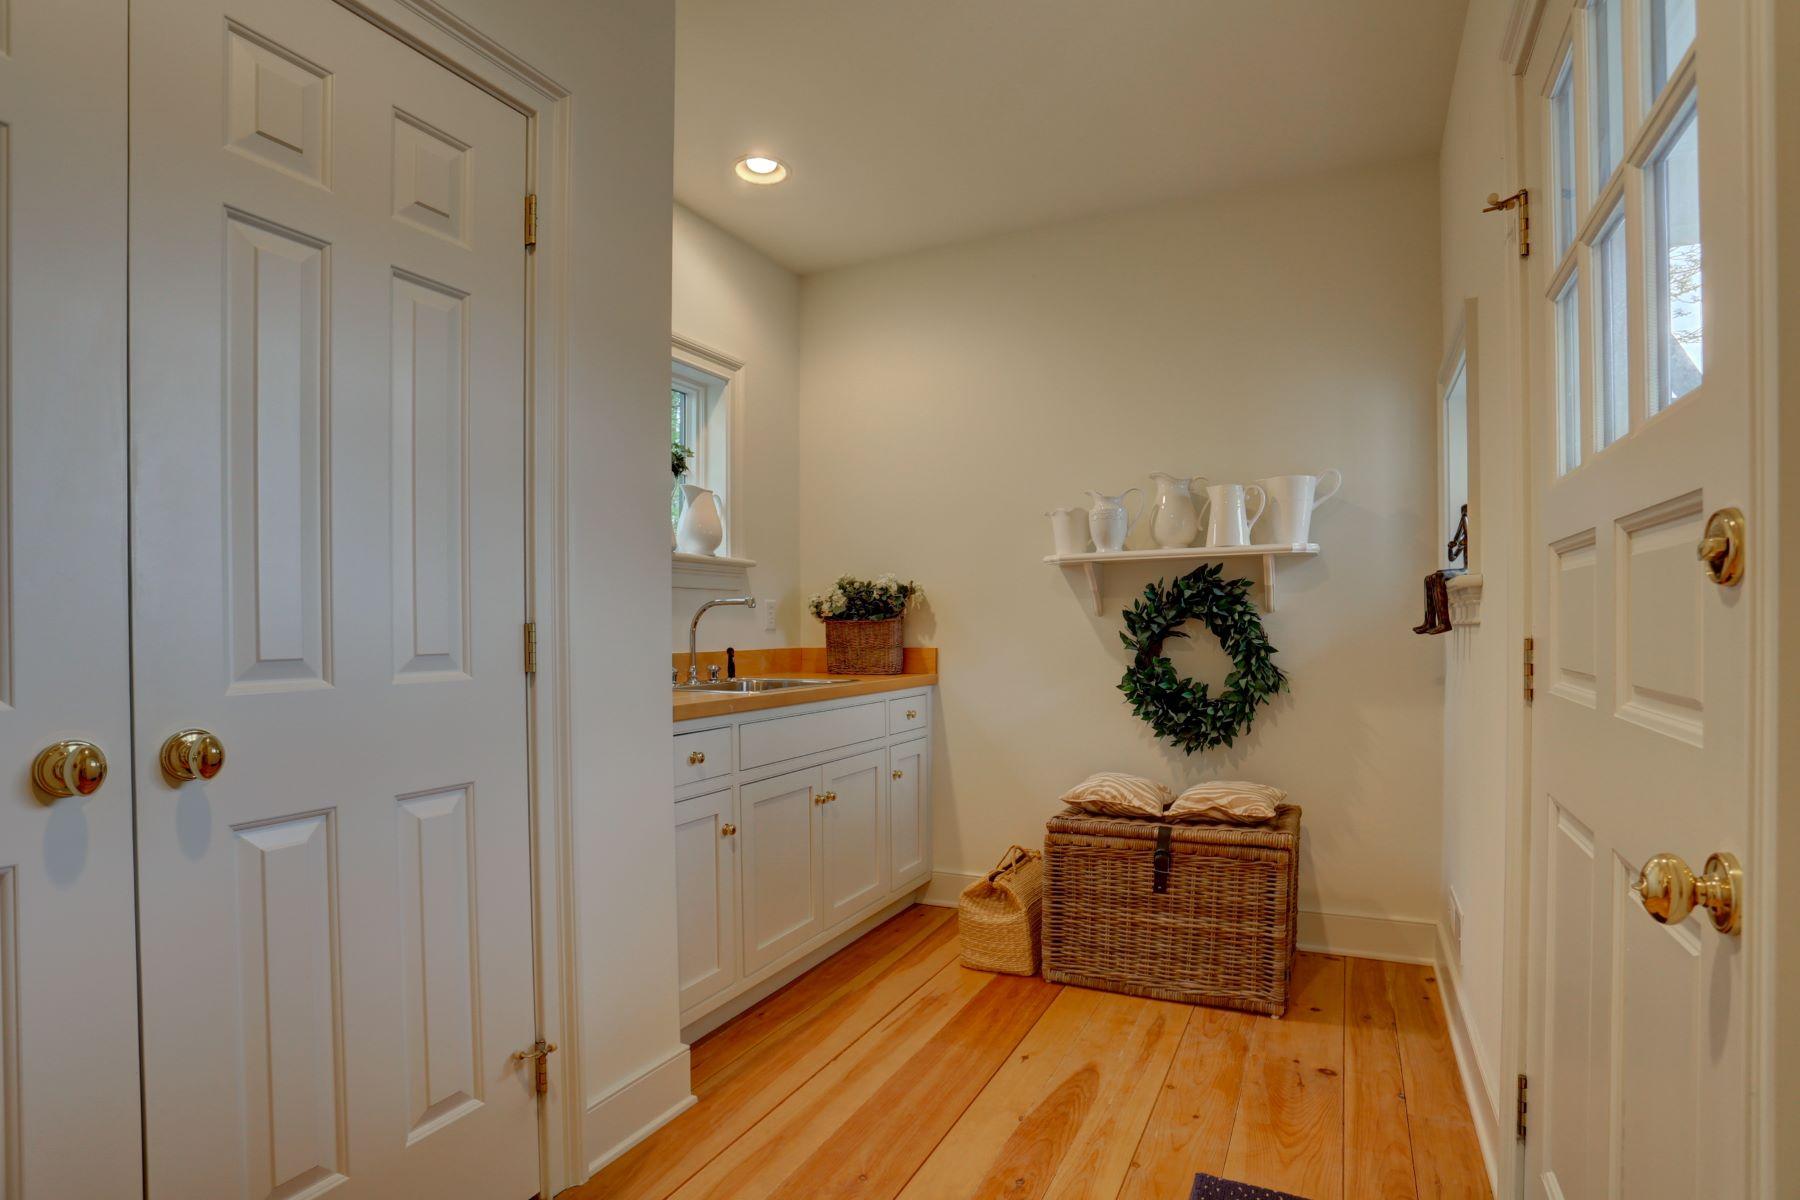 Additional photo for property listing at 56 Sunset Circle 56 Sunset Circle Lititz, Pennsylvania 17543 Estados Unidos